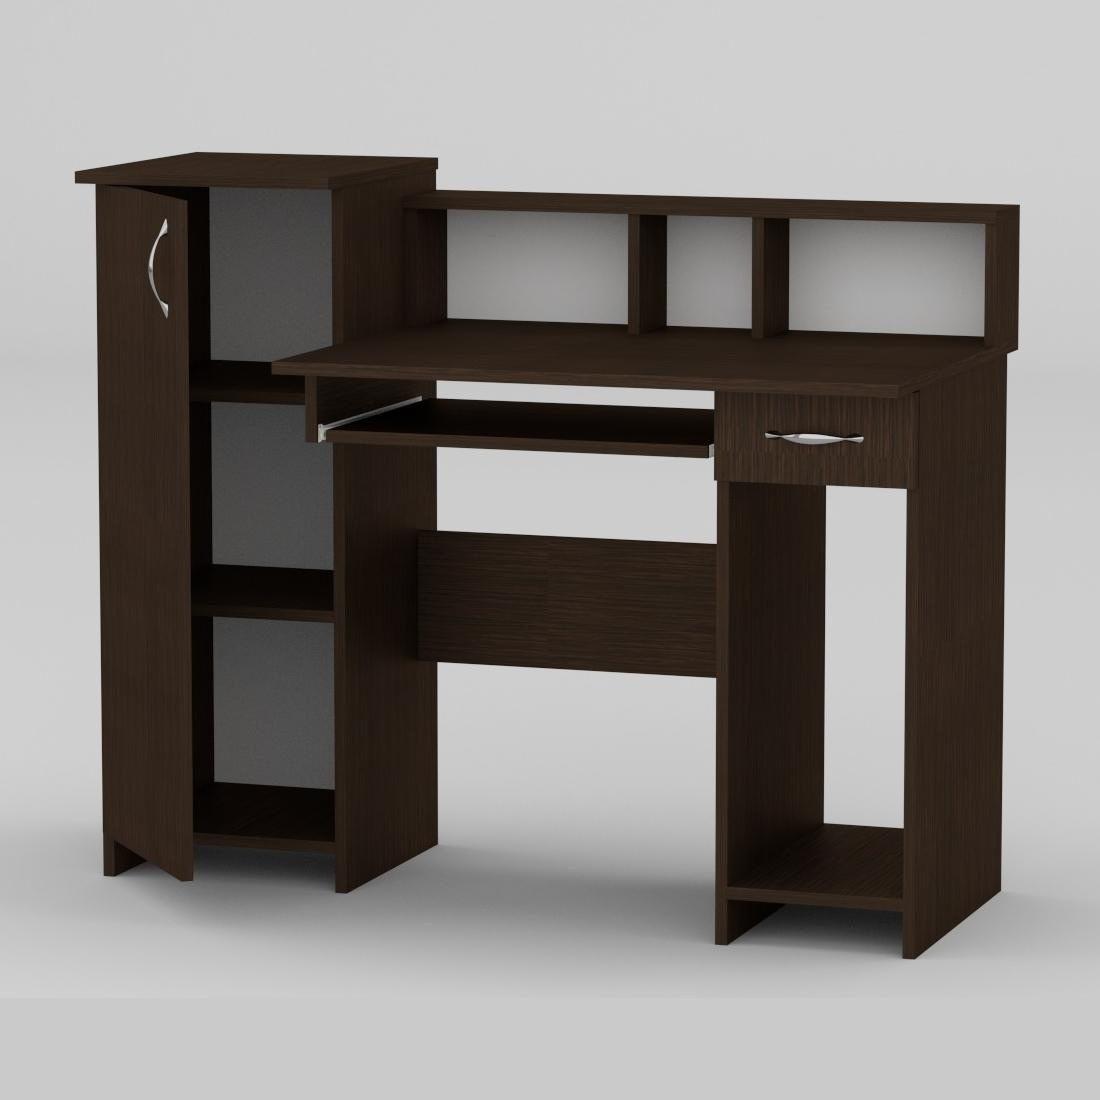 Компьютерный стол Компанит Пи-Пи-2 1175х600х736 мм венге